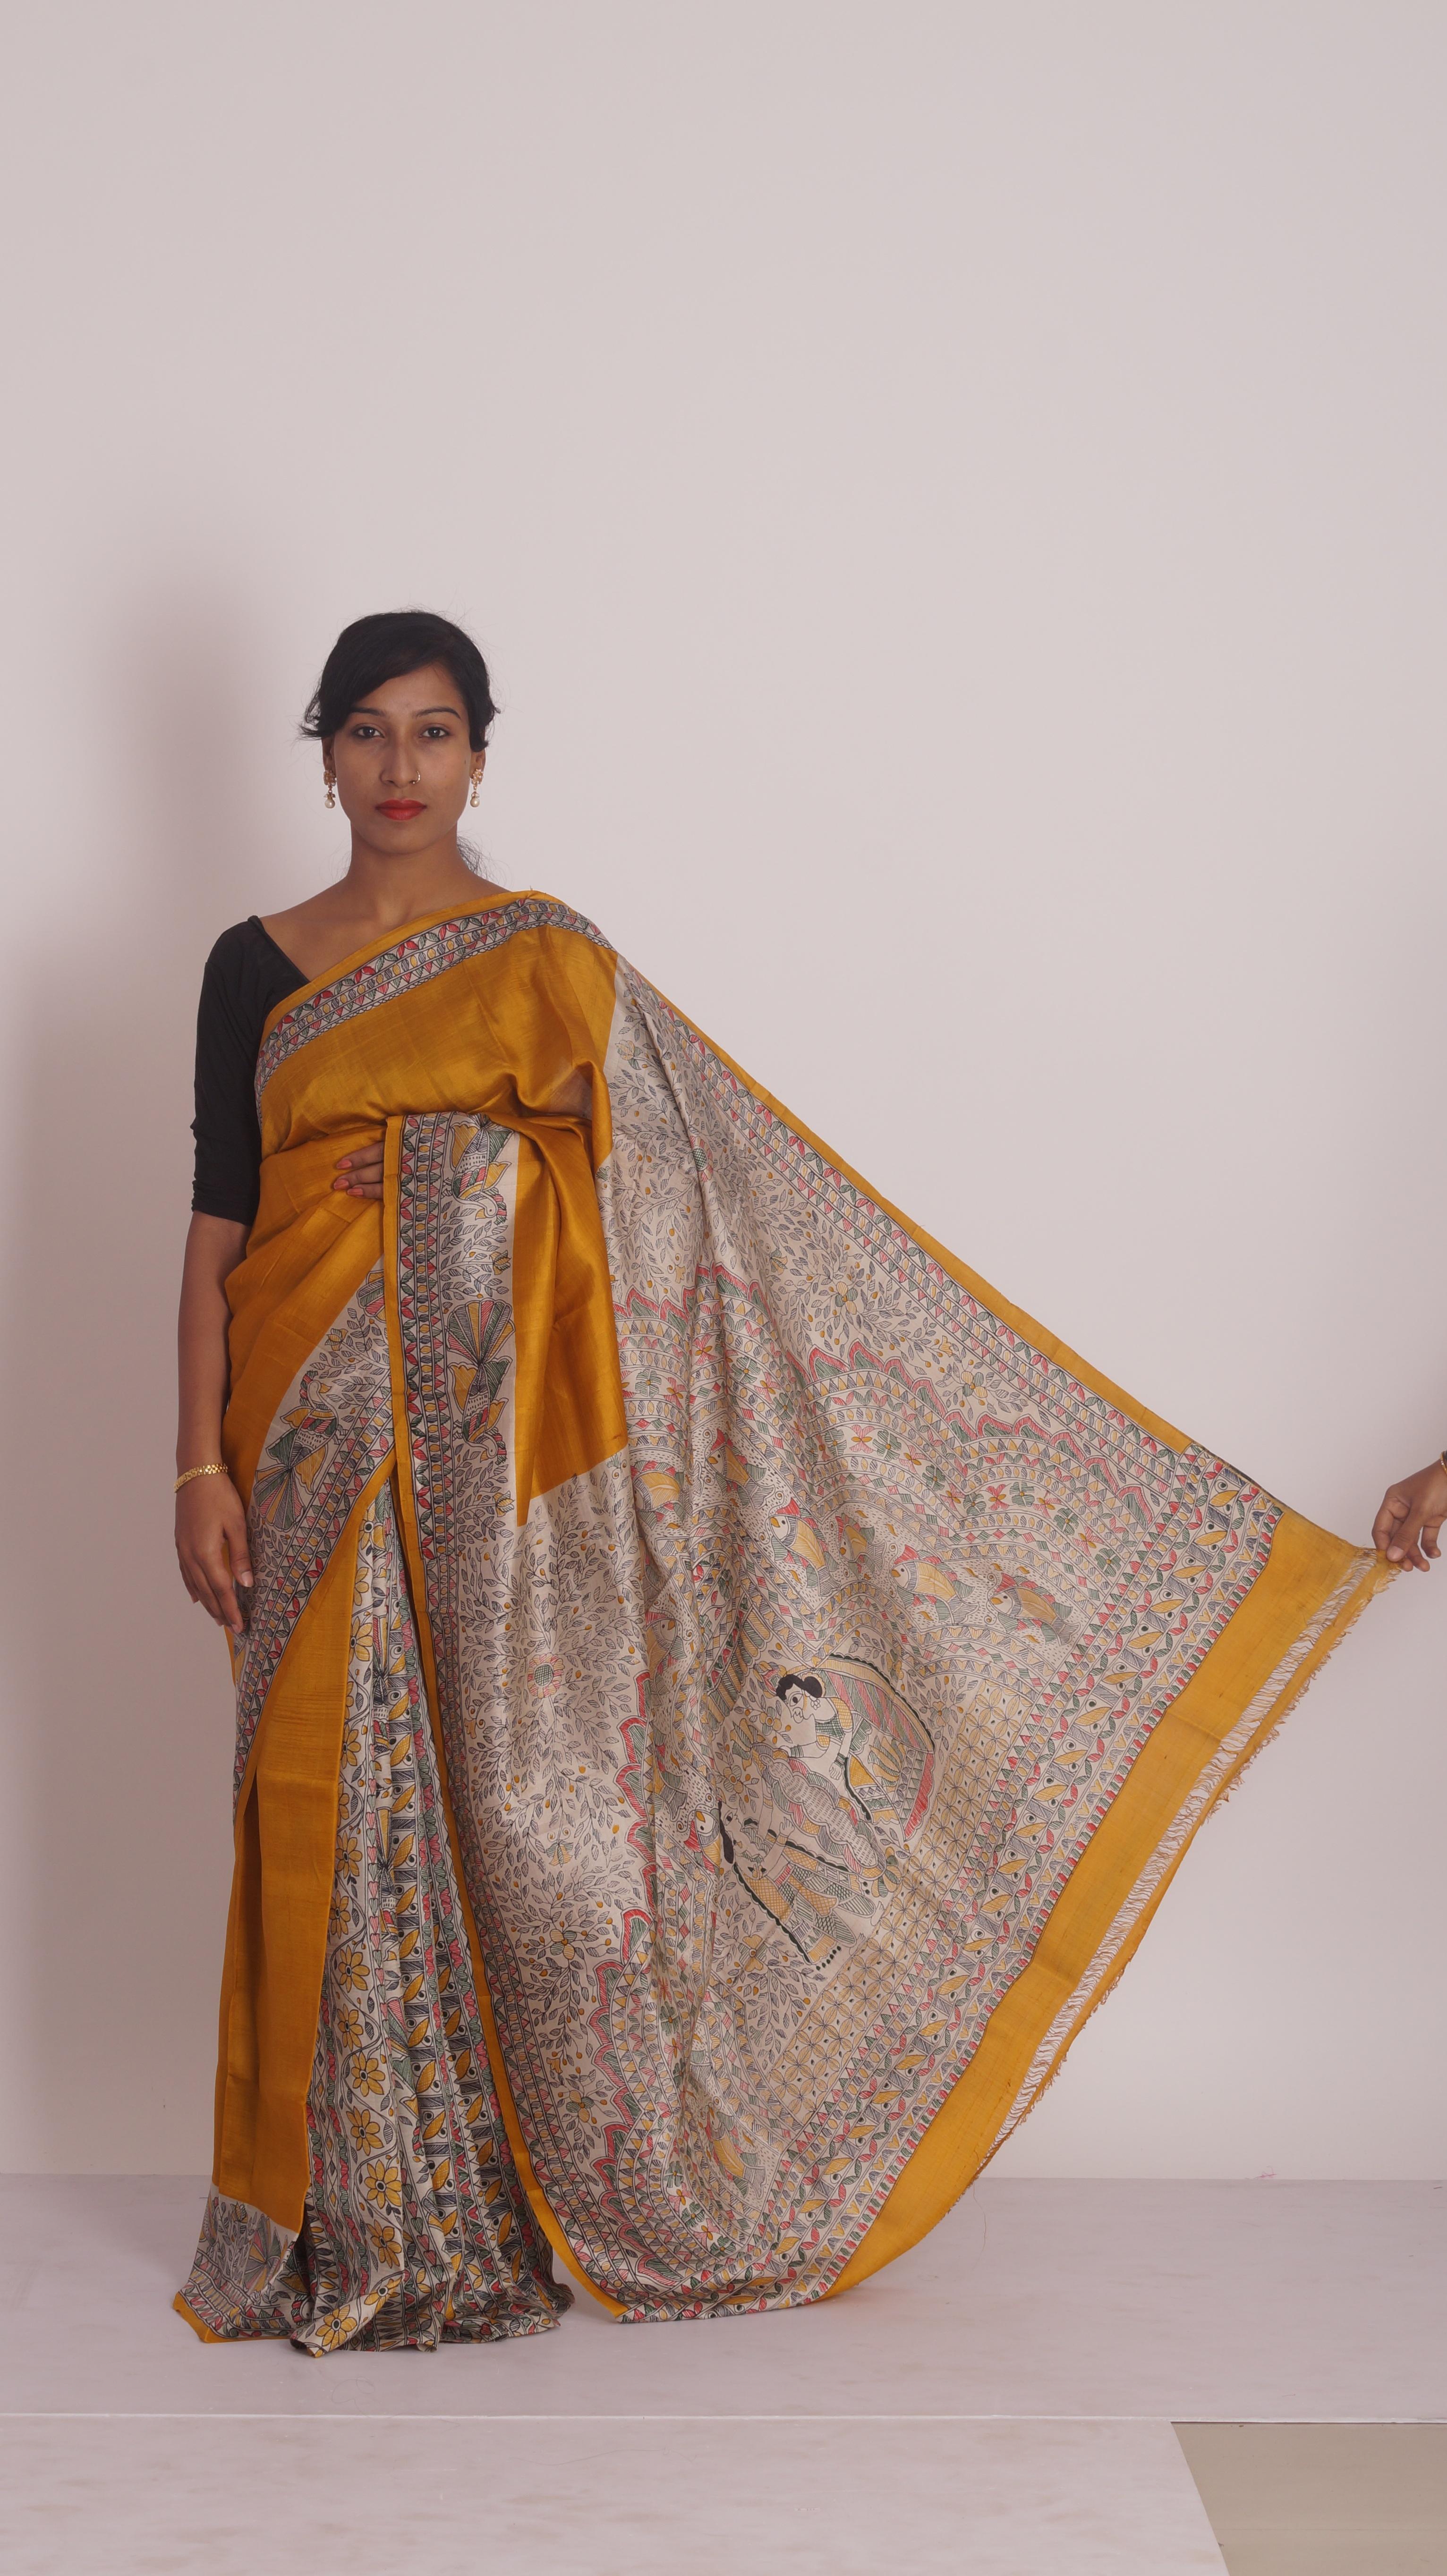 Free Images Spring Wedding Dress Textile Peach Sari